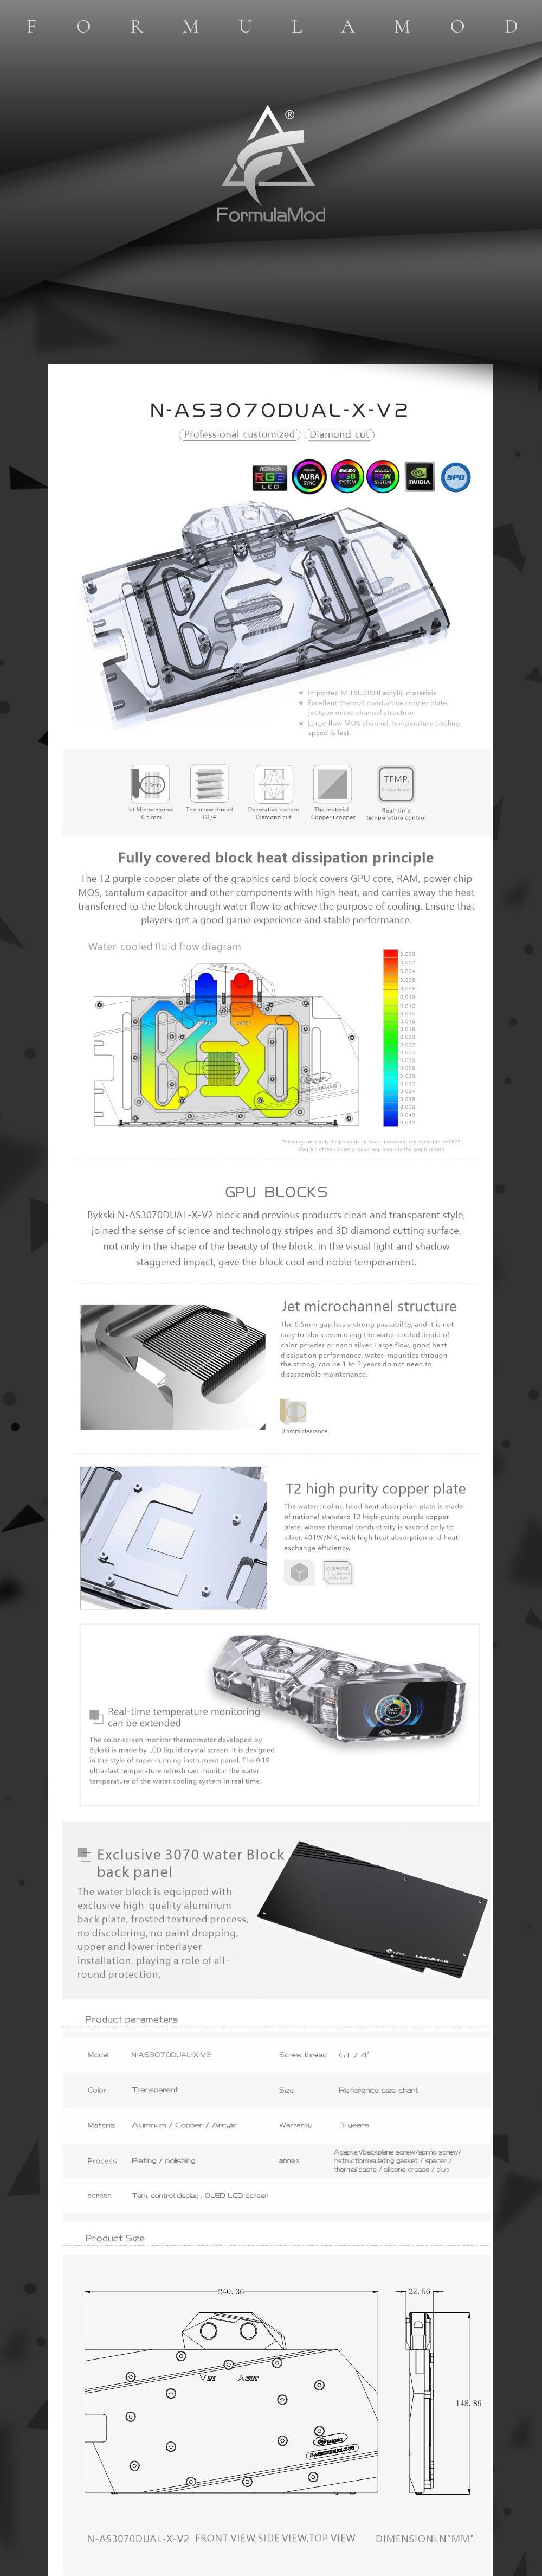 Bykski 3070 GPU Water Cooling Block For ASUS RTX3070 DUAL, Graphics Card Liquid Cooler System, N-AS3070DUAL-X-V2